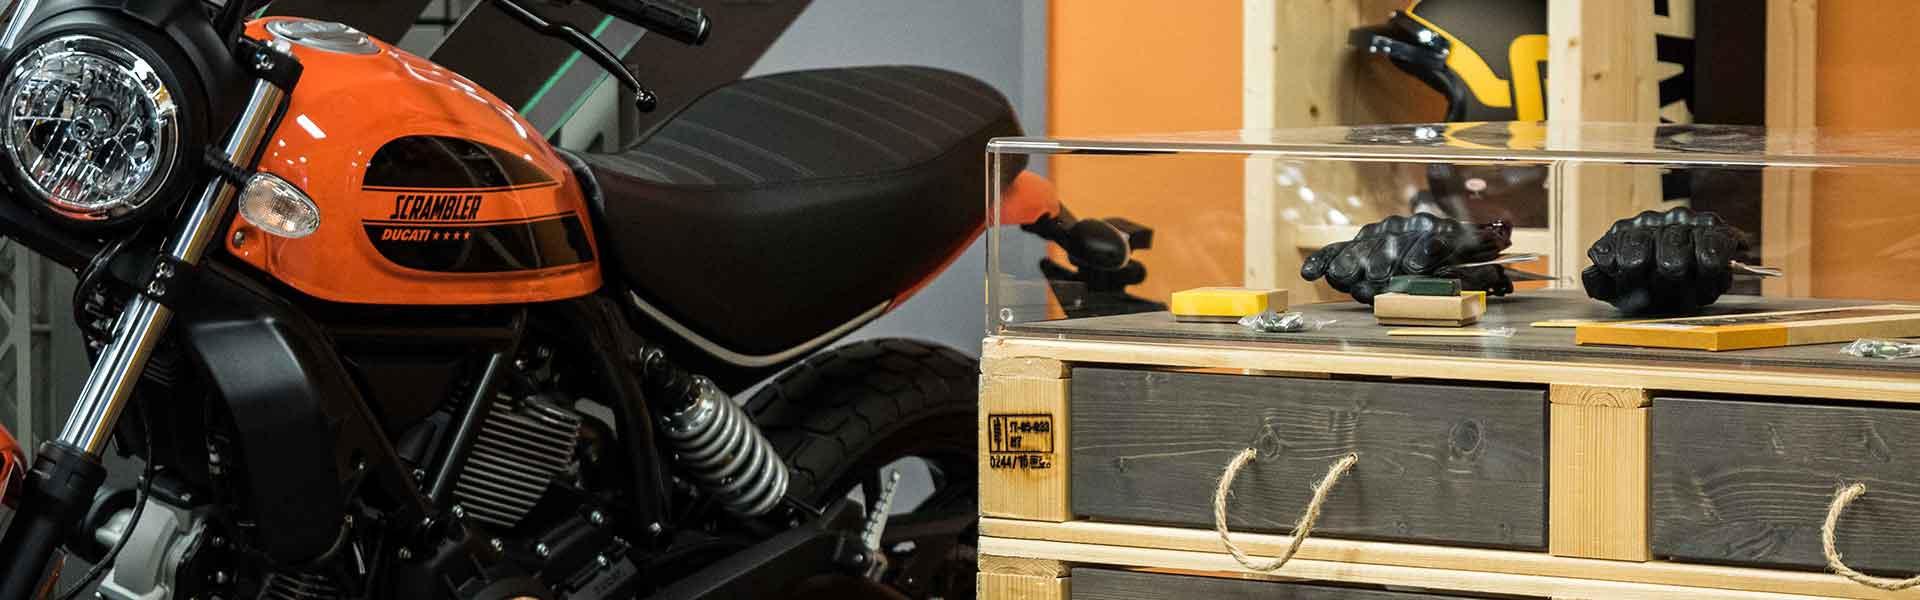 Ducati Scrambler Offroad Motorbikes